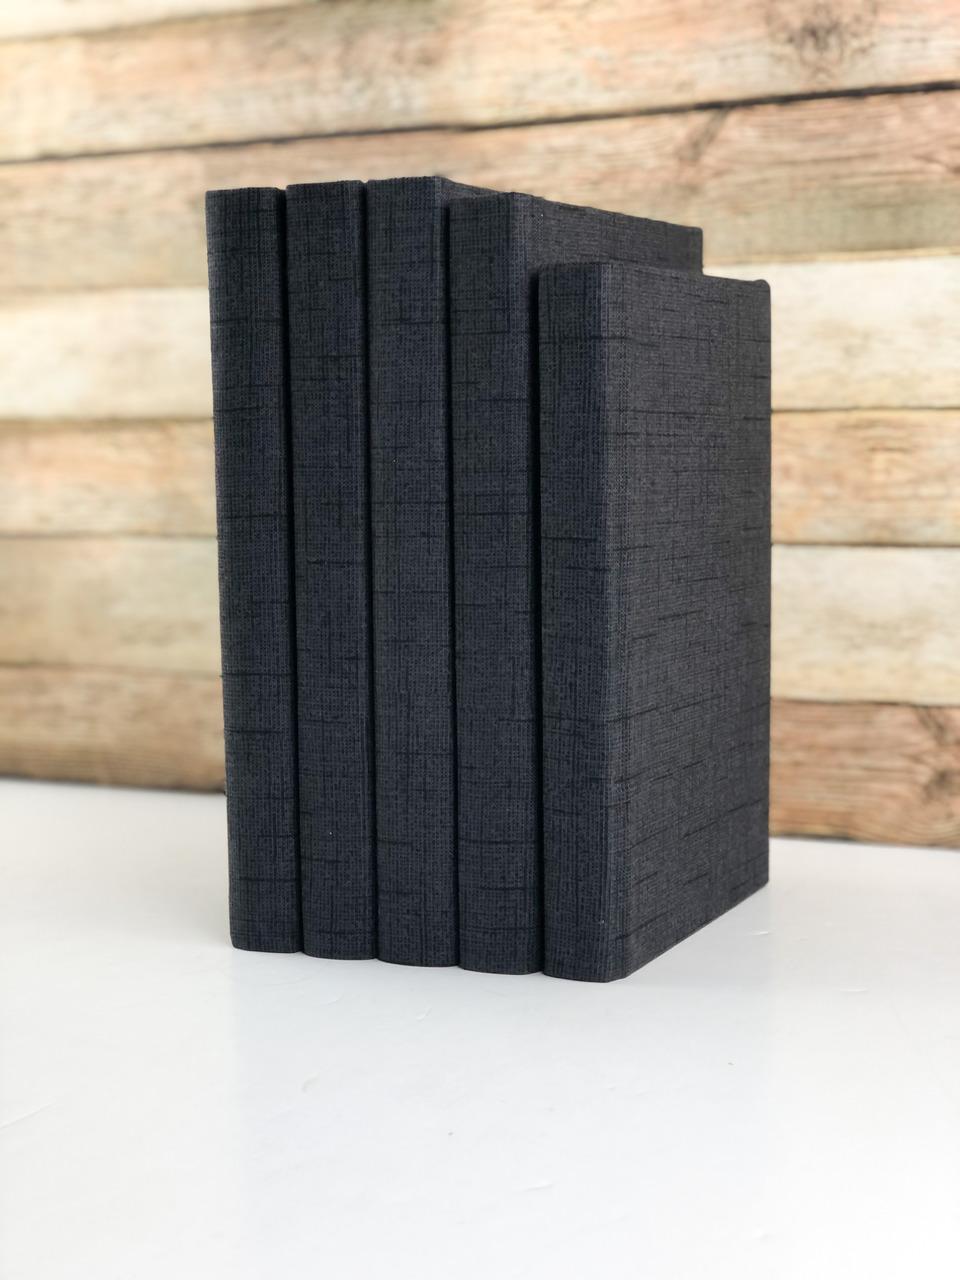 Set of 3 Decorative Books- Textured Black